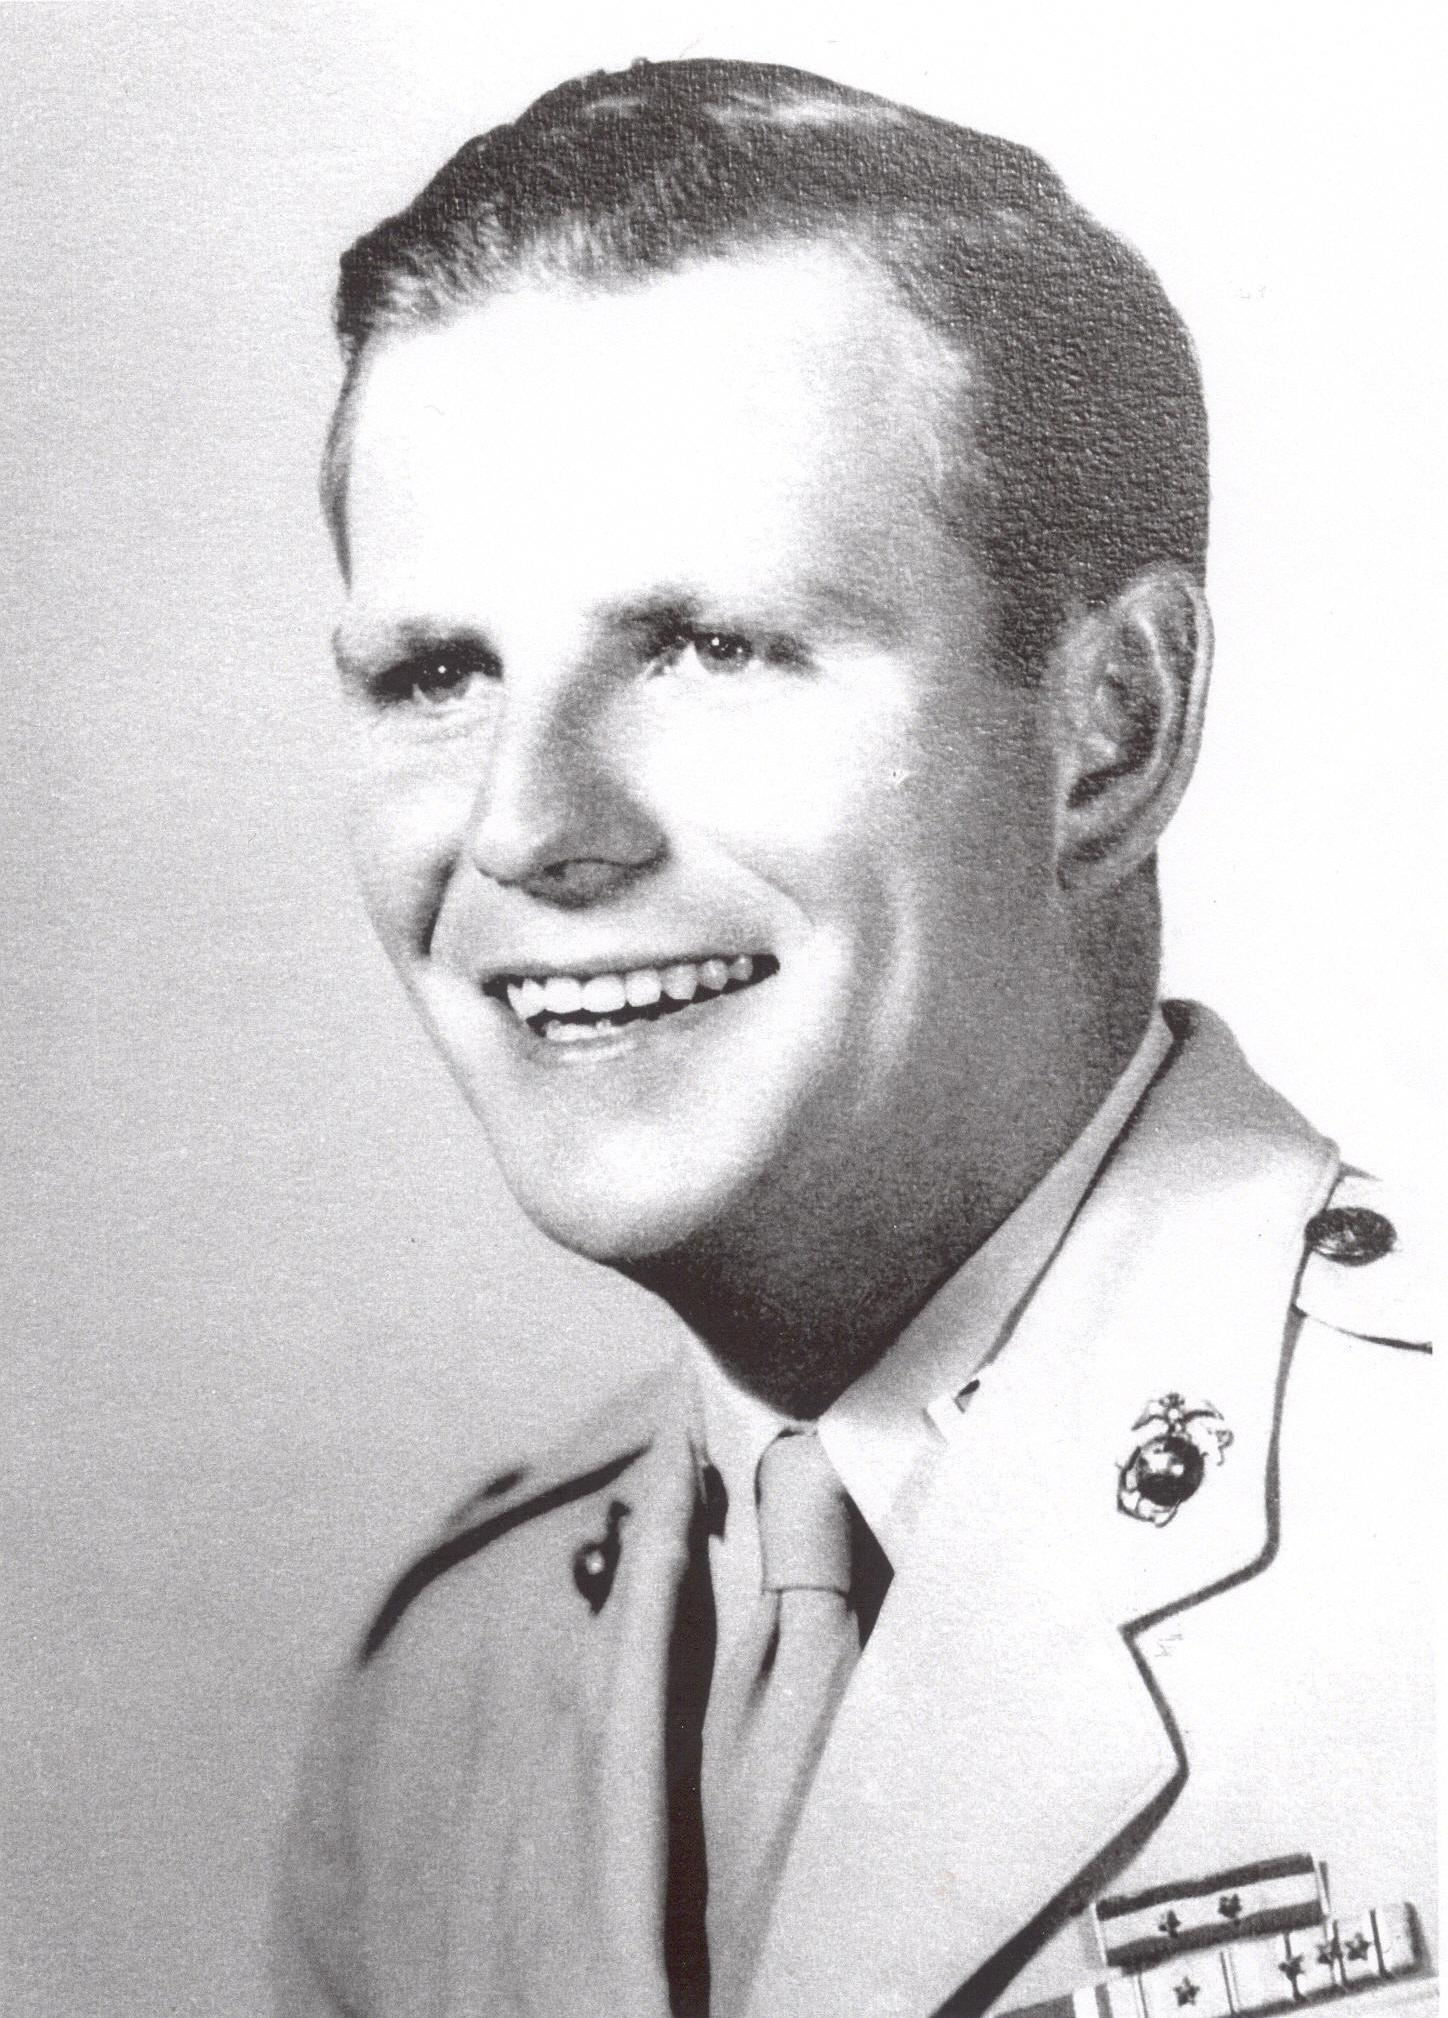 Capt George William Stivers, Jr